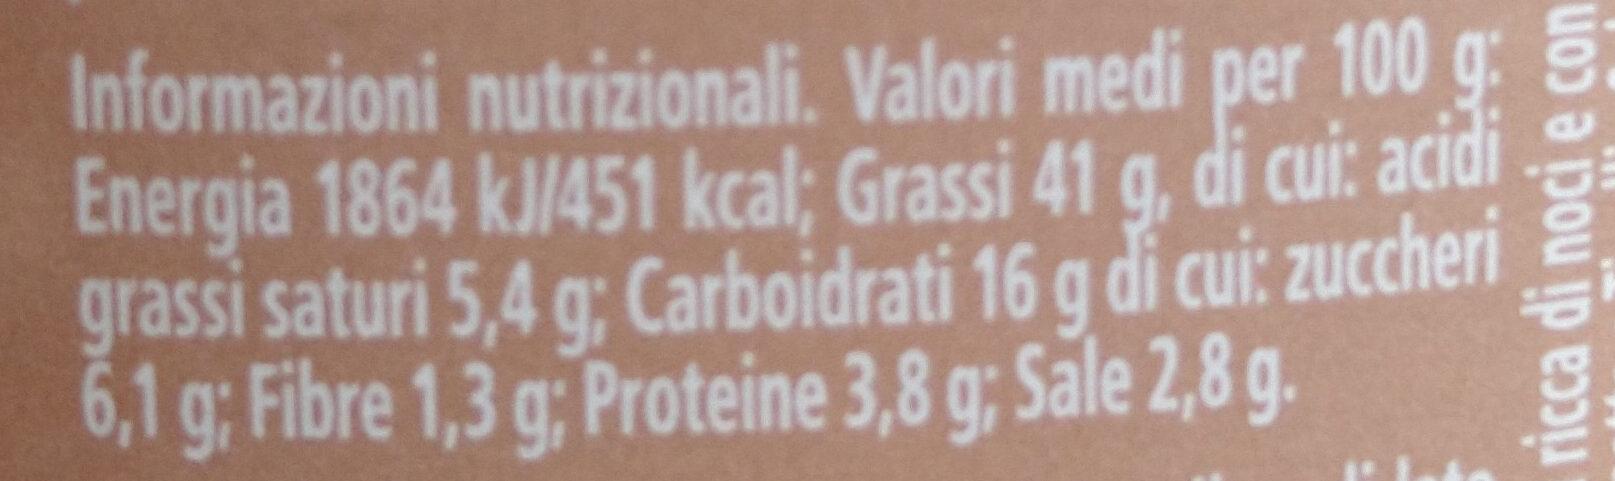 salsa di noci - Informazioni nutrizionali - it